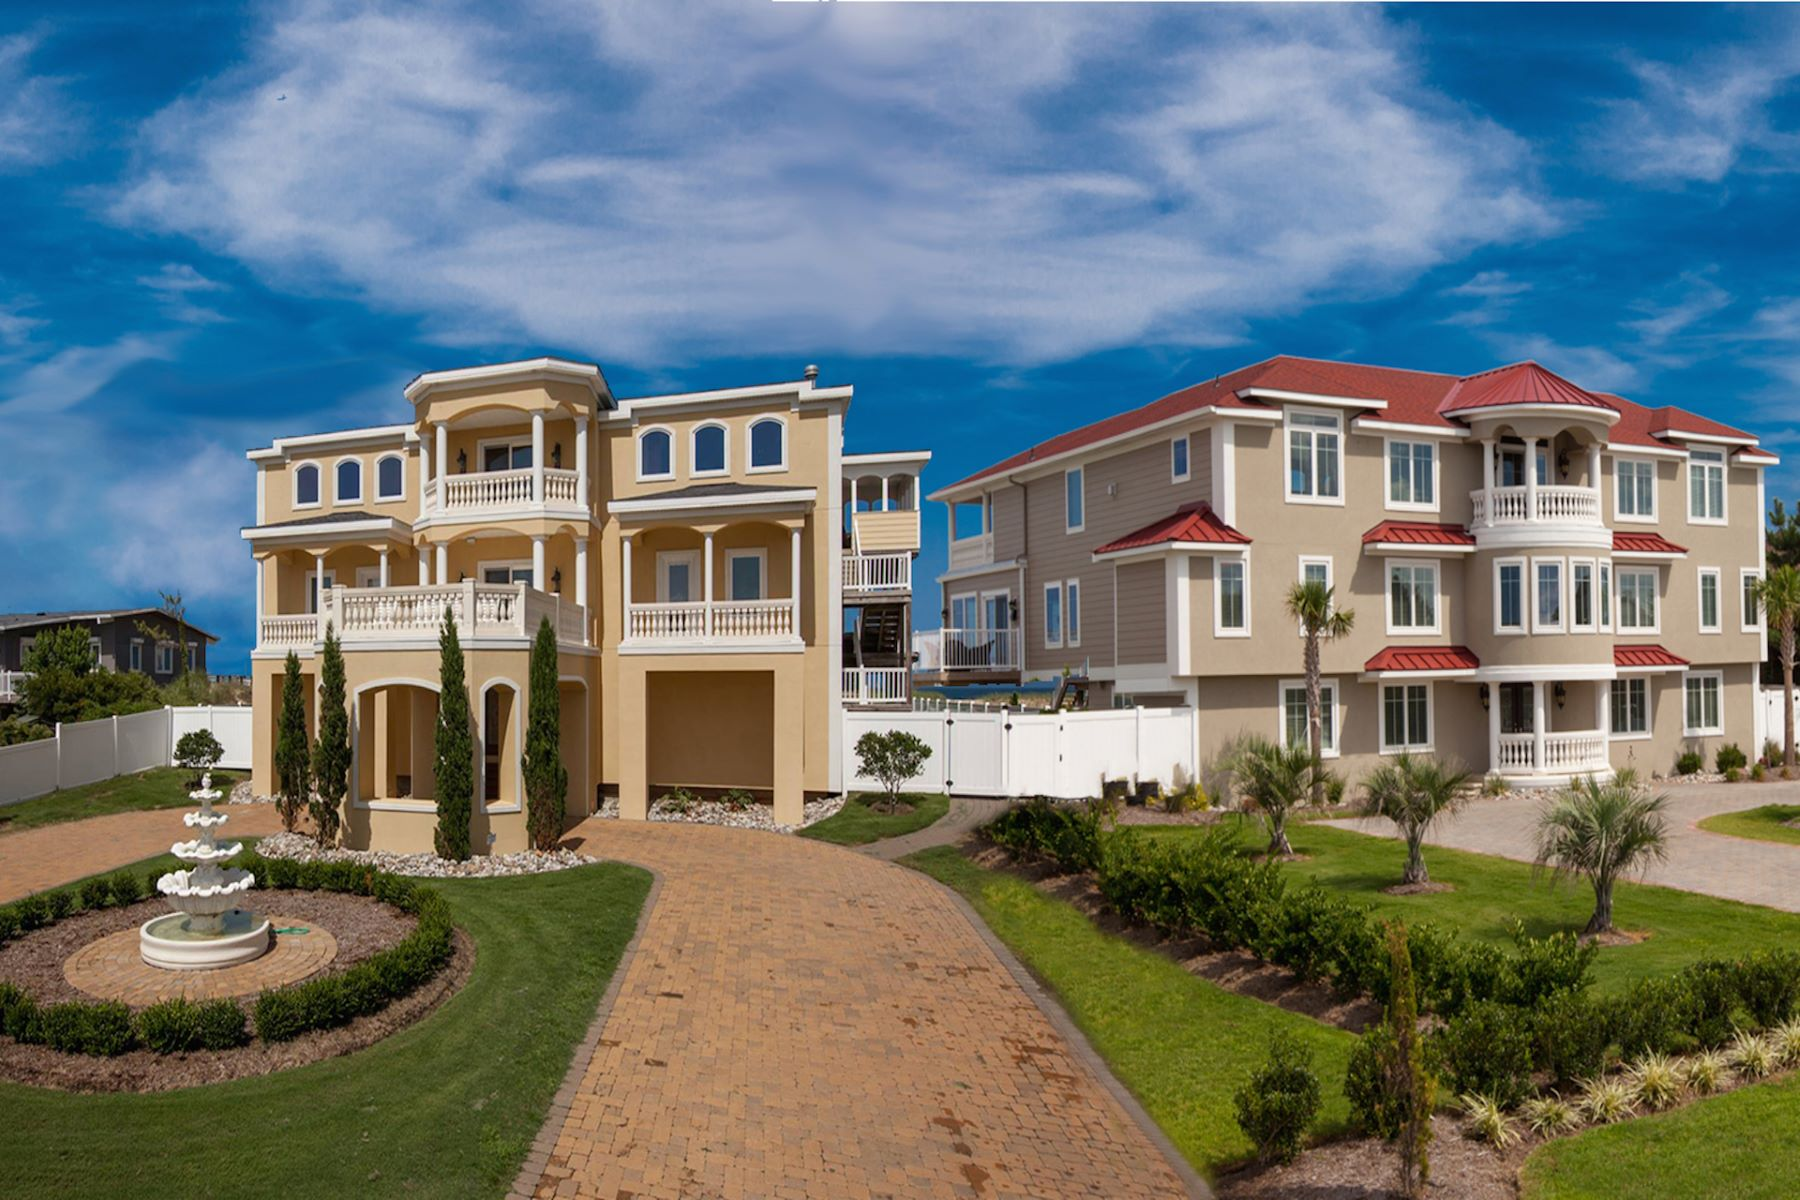 سكني الآخرين للـ Sale في Palazzo Bella Vita - Sandbridge Beach 2304 Sandfiddler Road Virginia Beach, Virginia, 23456 United States